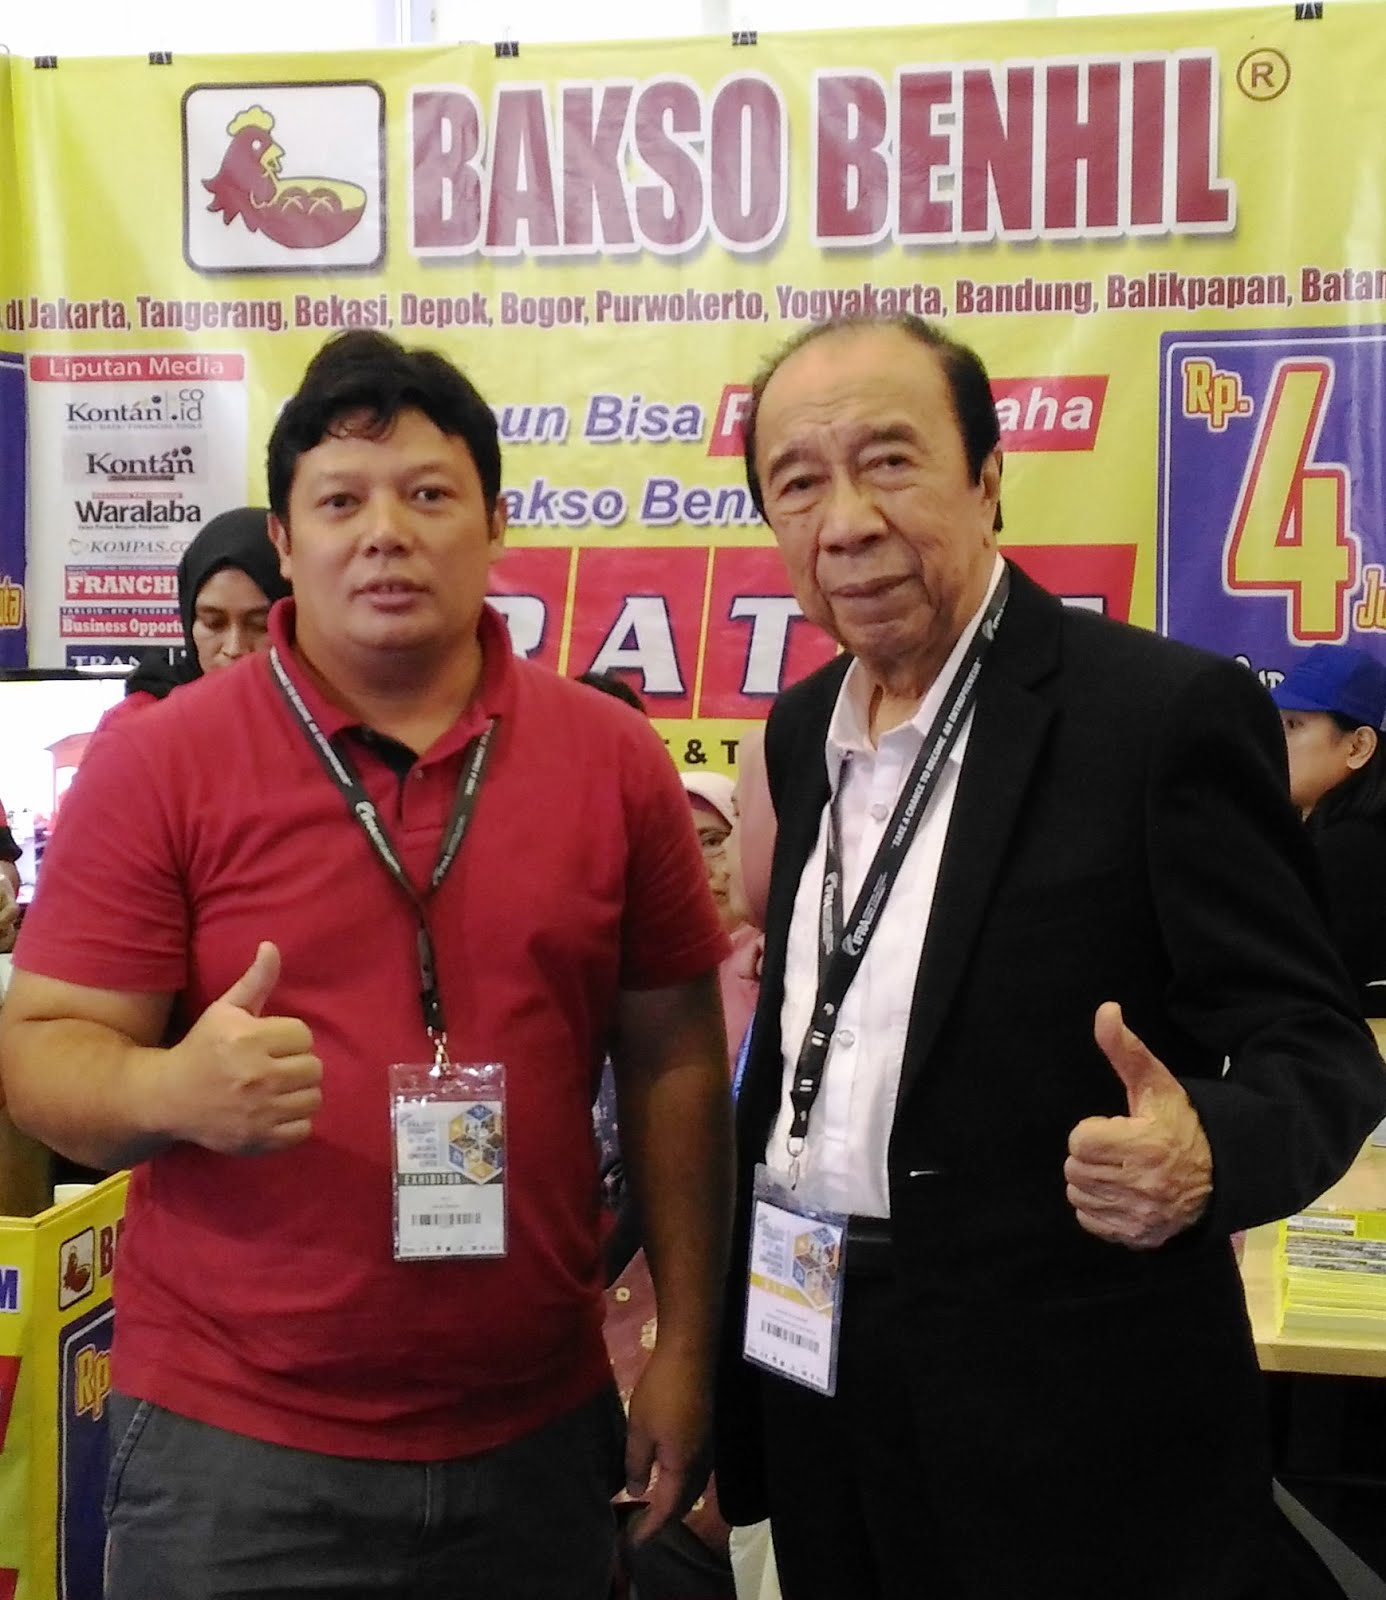 Bp. Anang Sukandar ketua AFI